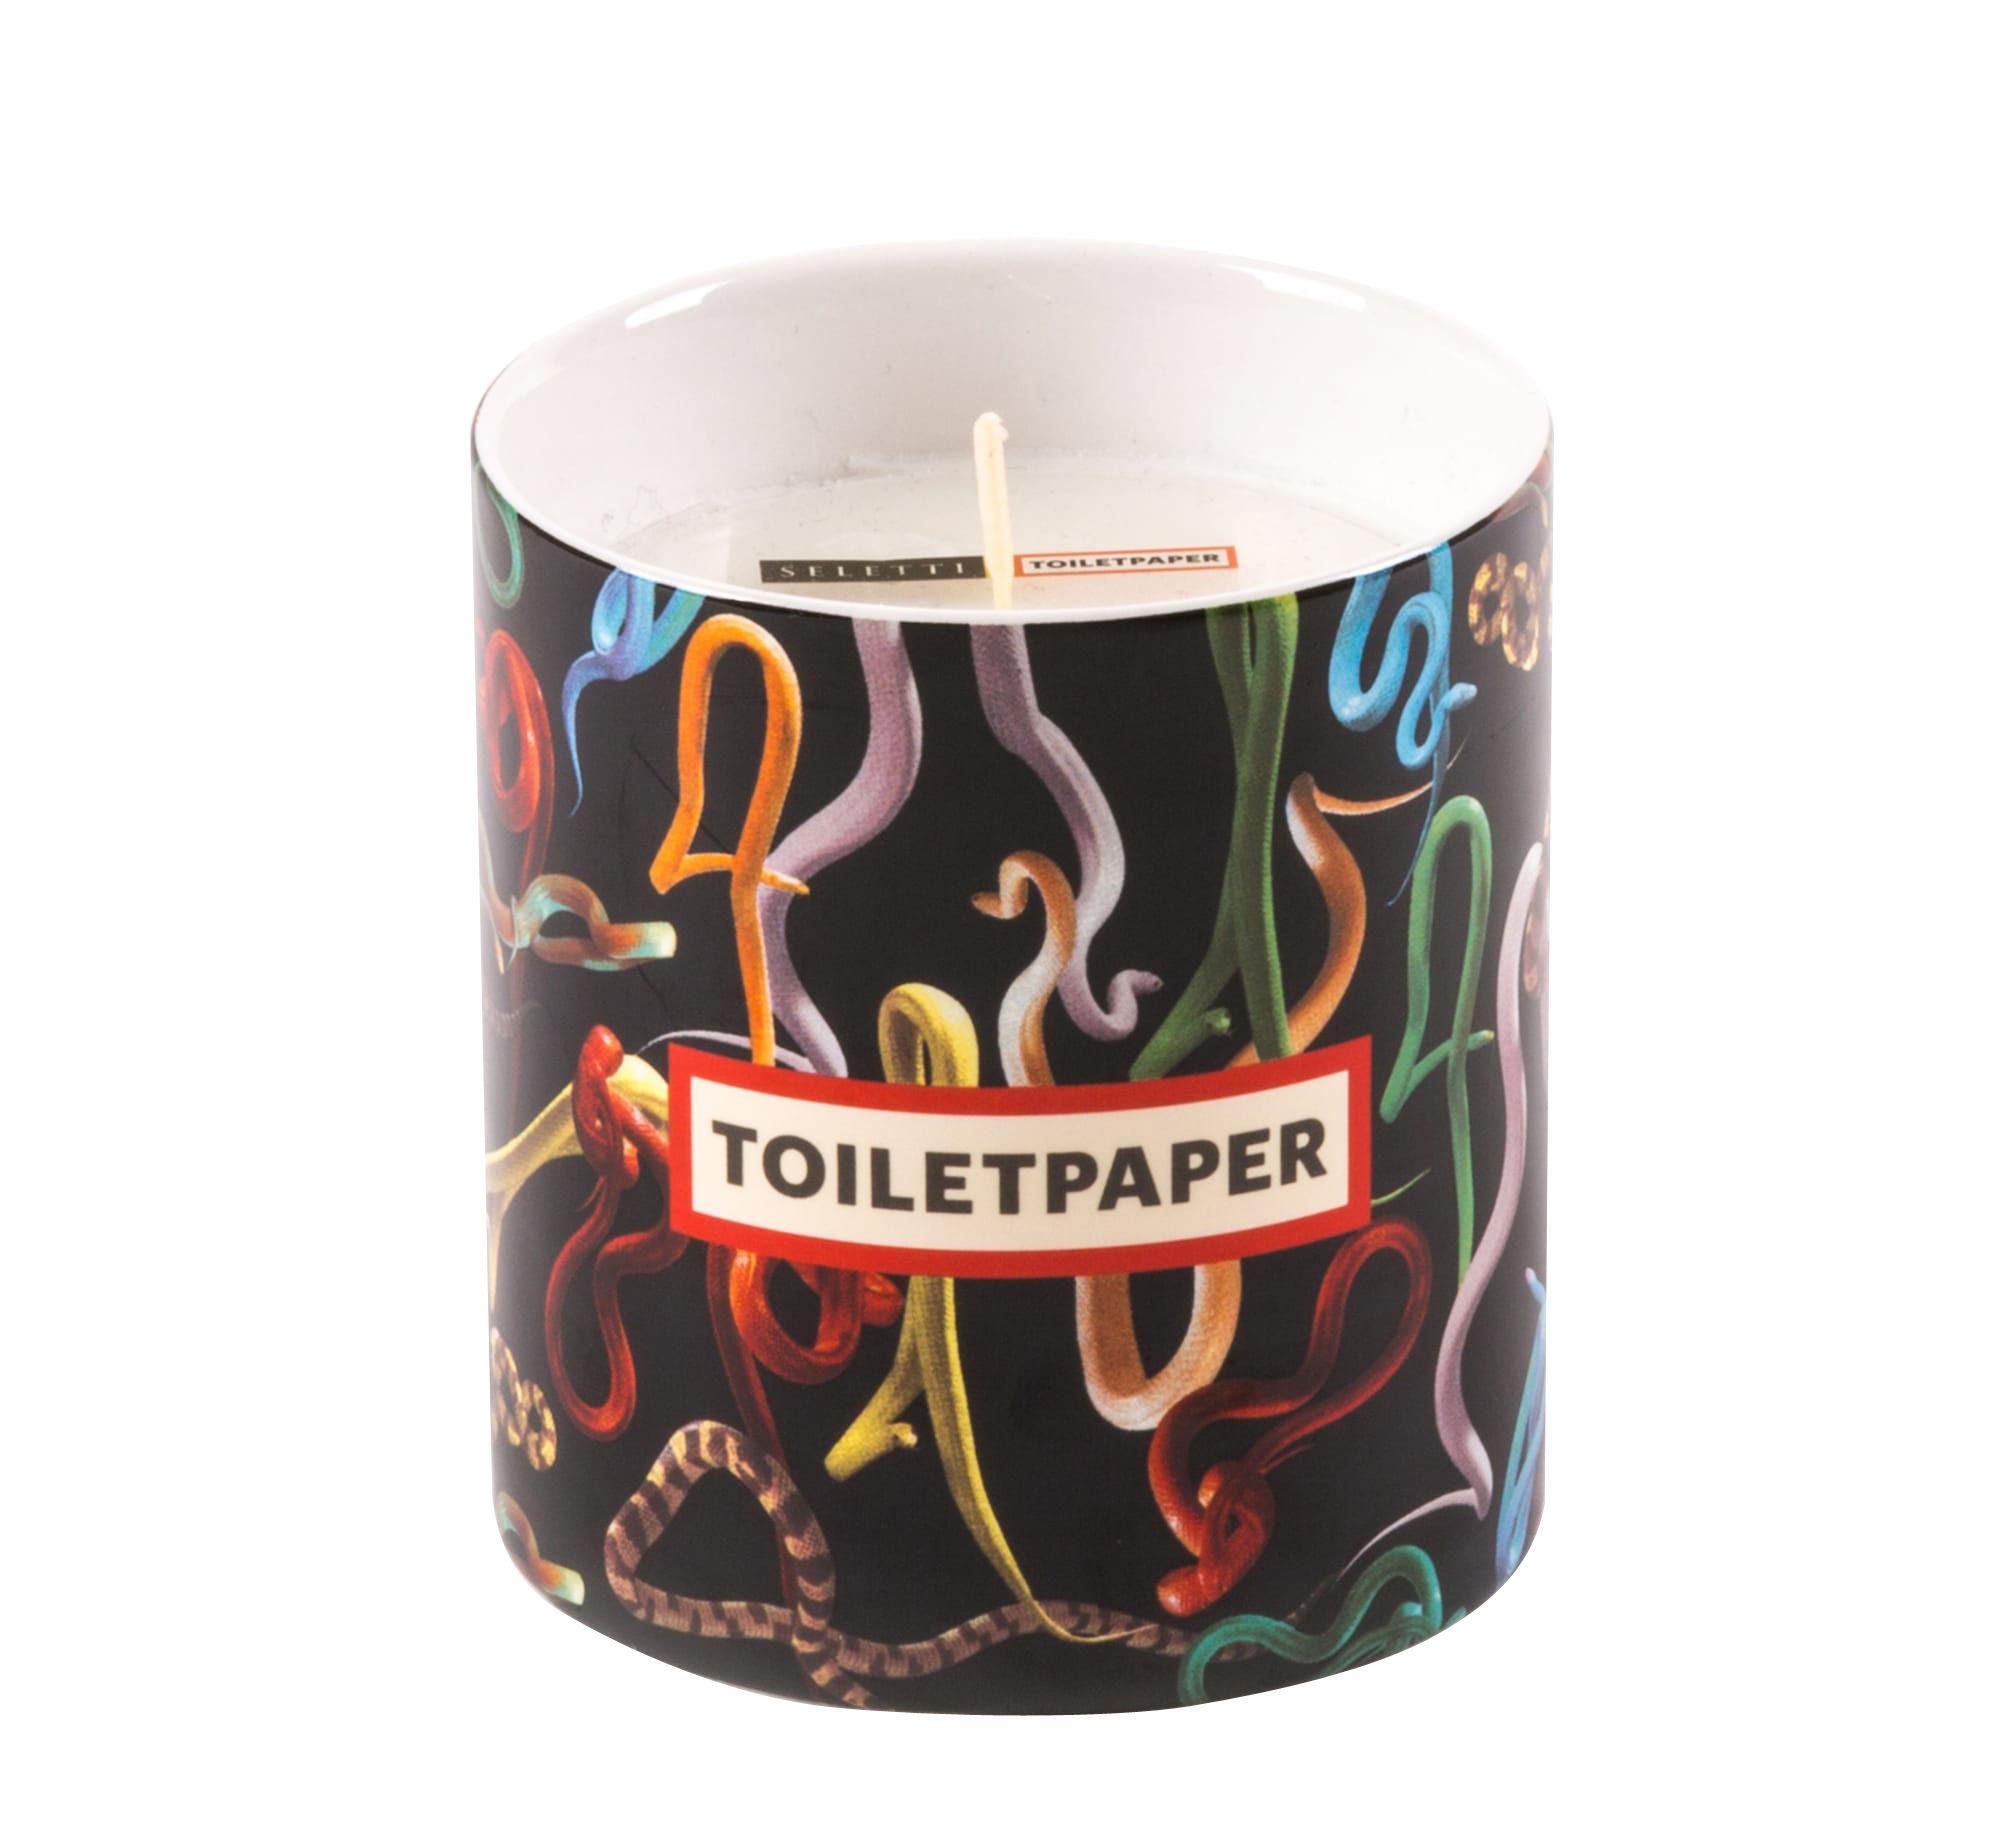 Interni - Candele, Portacandele, Lampade - Candela profumata Toiletpaper - Snakes - / Porcellana di Seletti - Snakes / Nero -  Cire naturelle, Porcellana